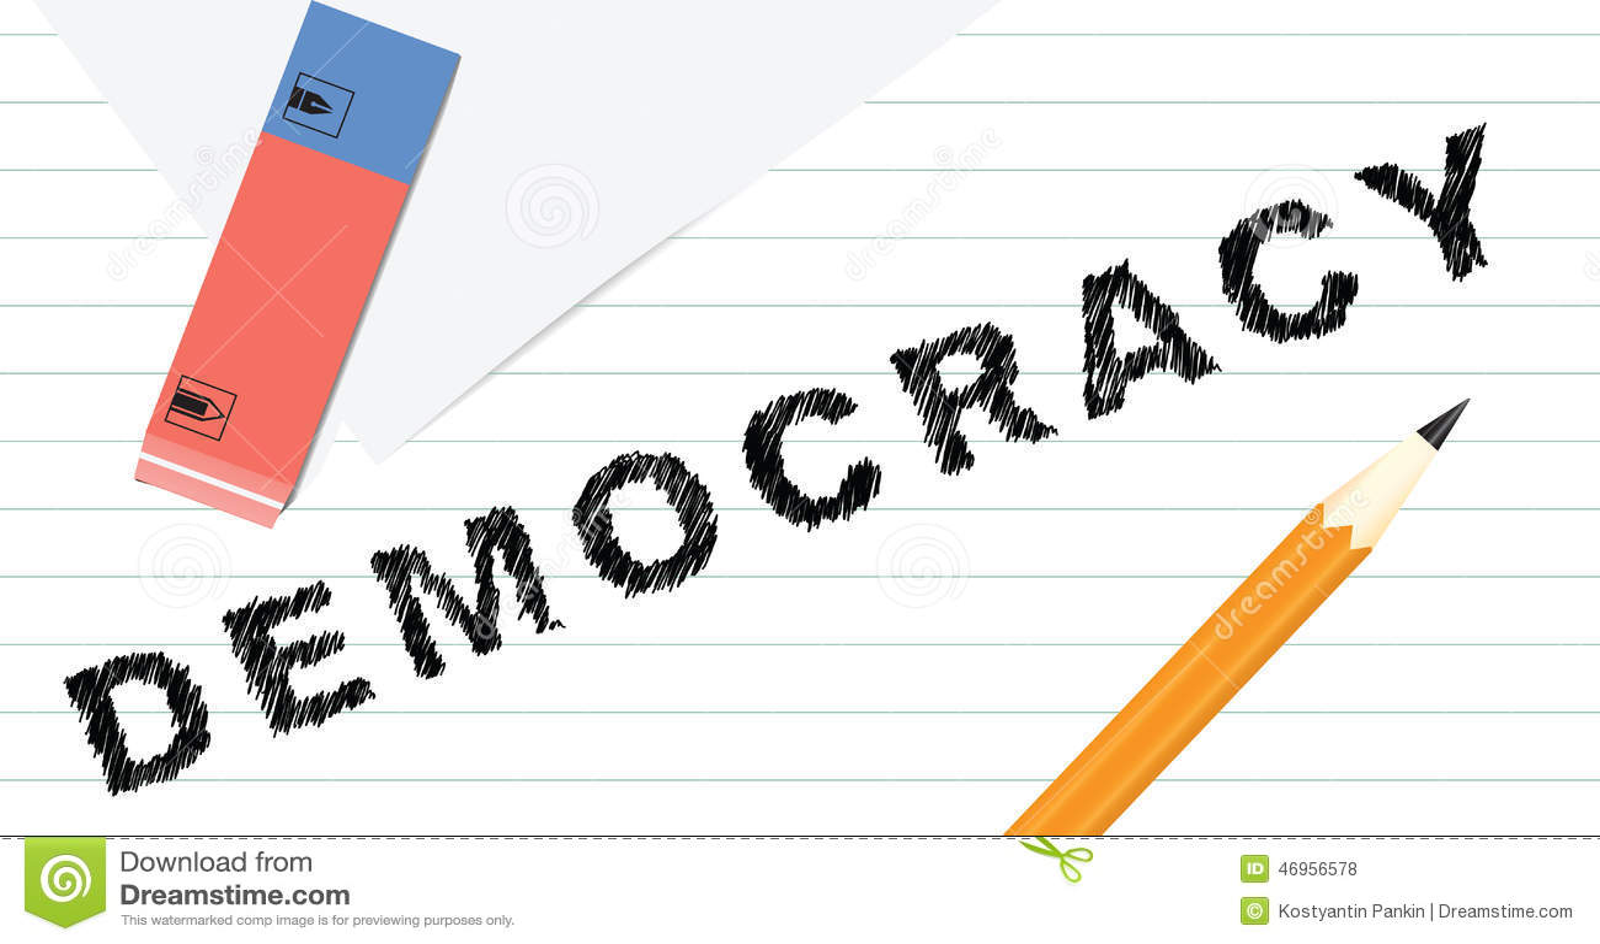 Democracy >> Google Images